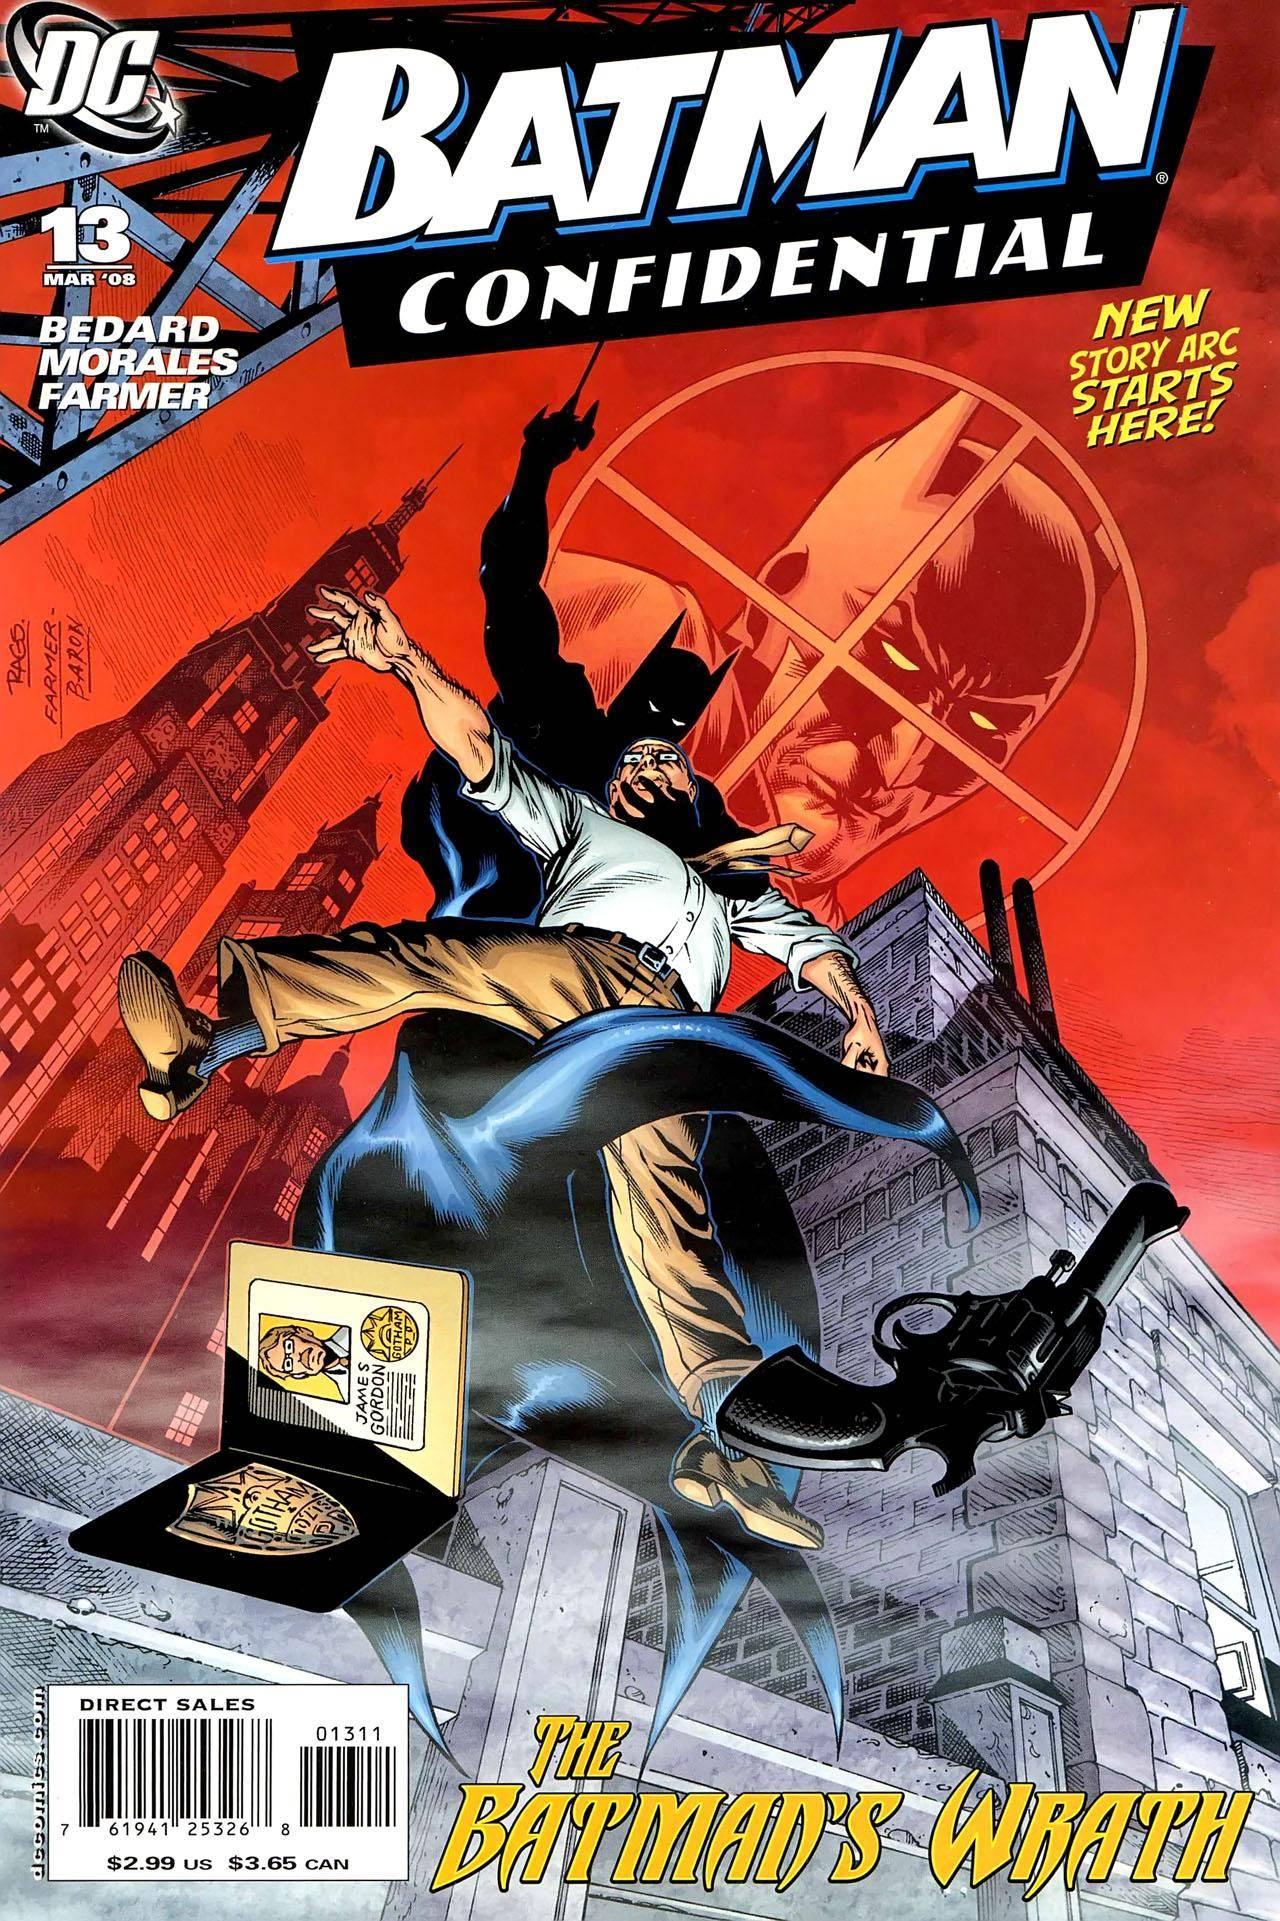 Batman Confidential 013 2008